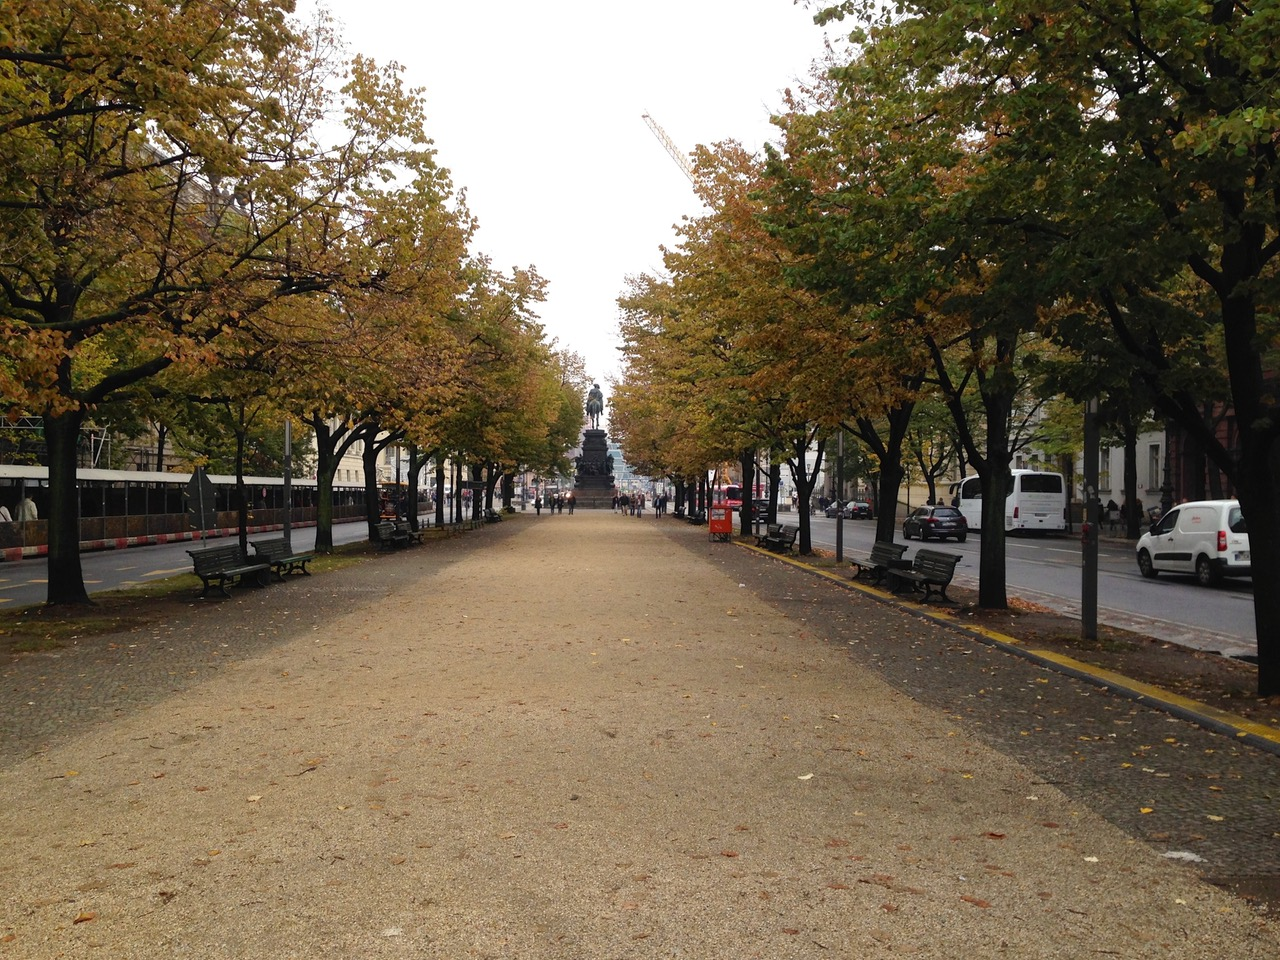 Taking a walk Unter den Linden in Berlin, Germany